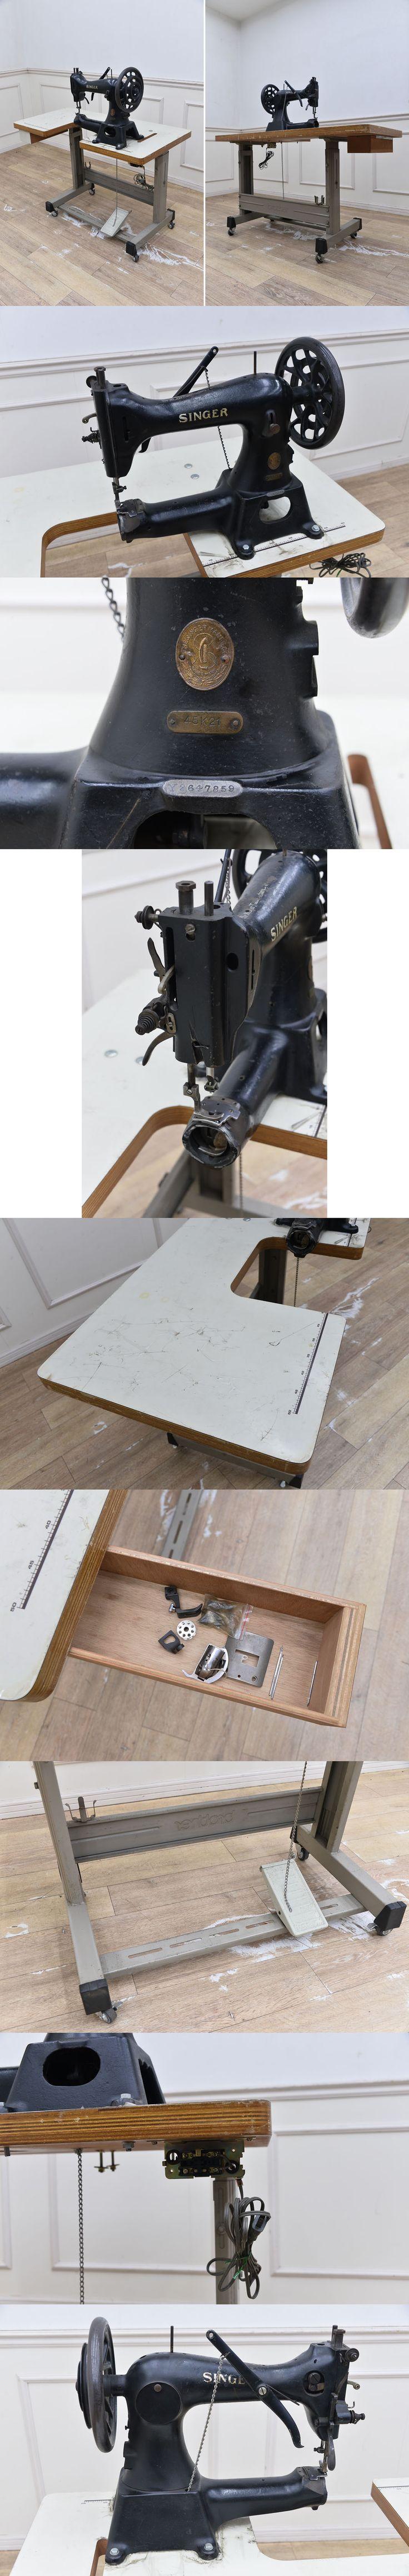 IQ08 業務用 工業用 SINGER 45K21 ミシン 革 皮... - ヤフオク!